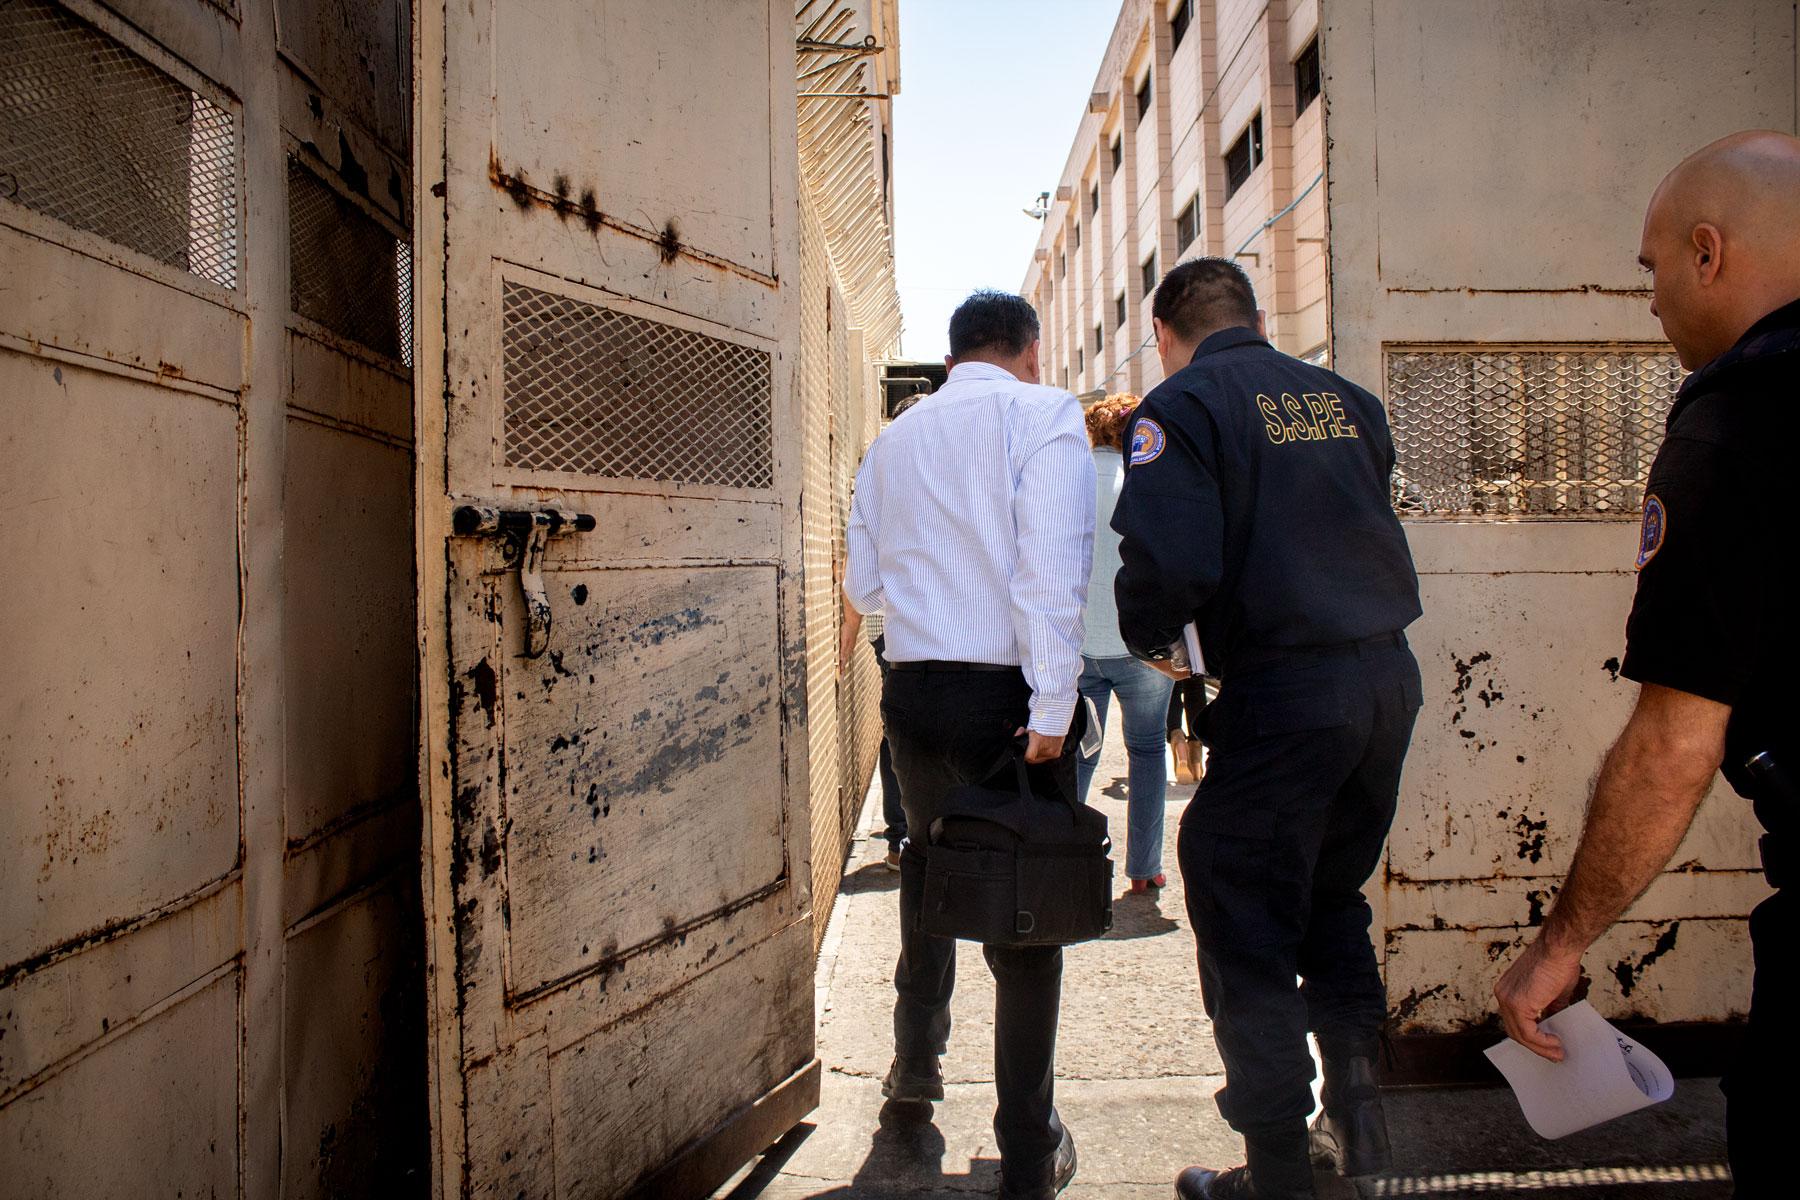 La alarmante realidad de la custodia penitenciaria